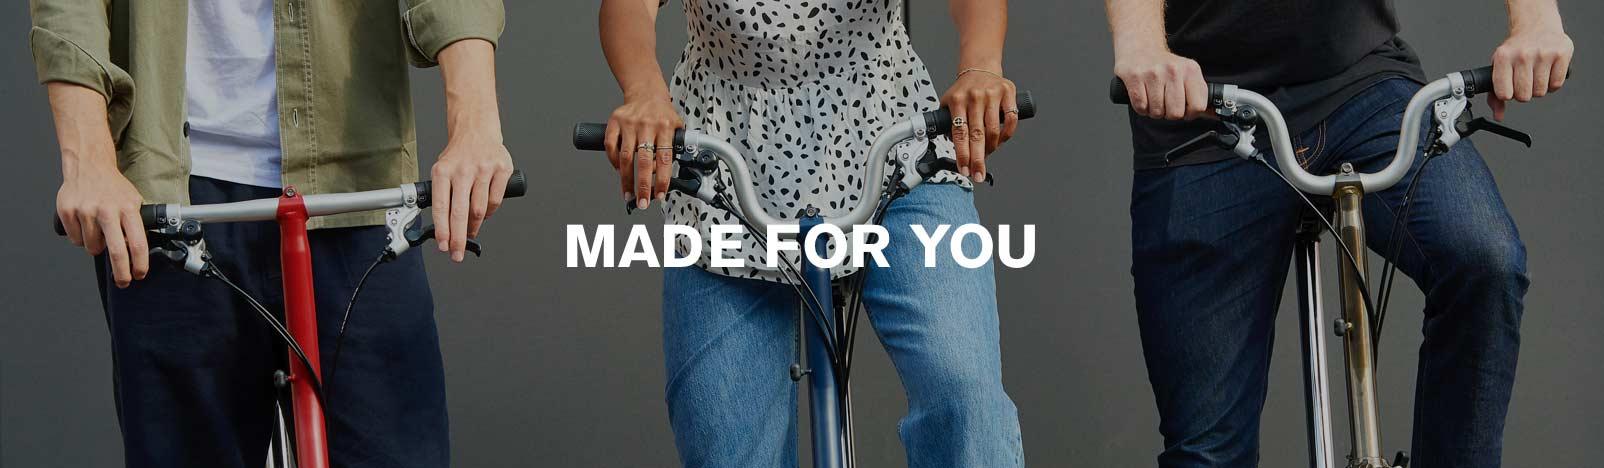 Brompton Bicycle, Model Year 21, MY21